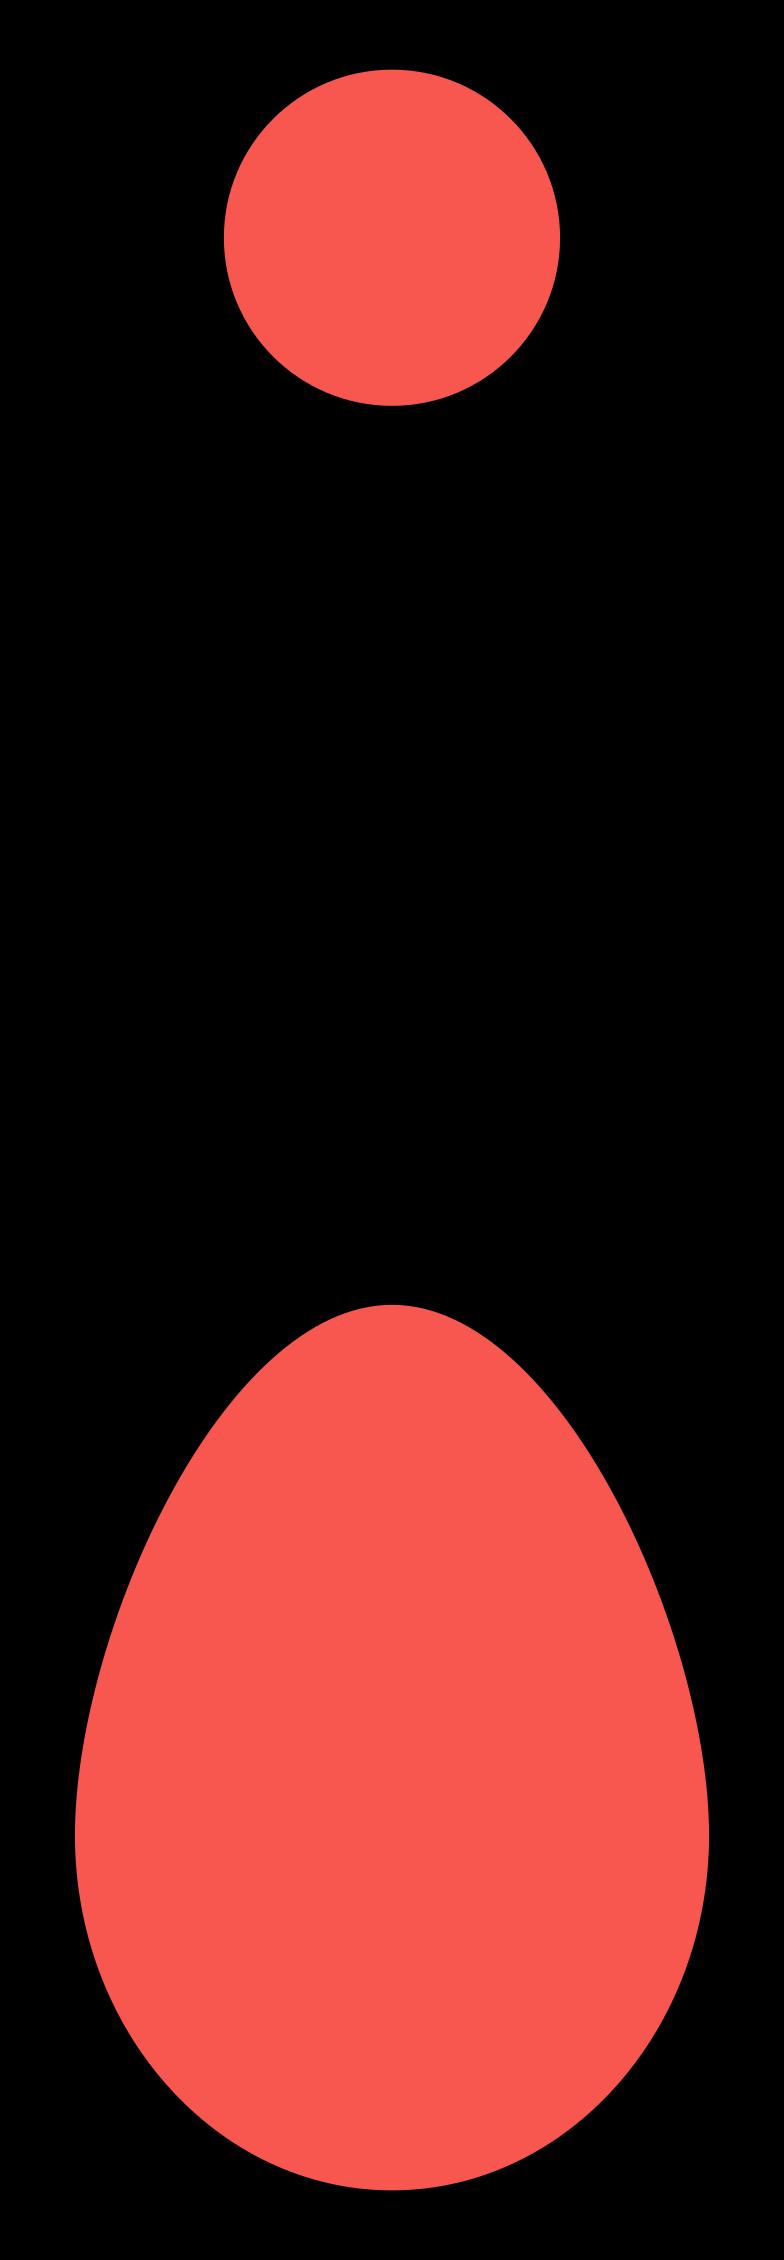 scientist drops Clipart illustration in PNG, SVG